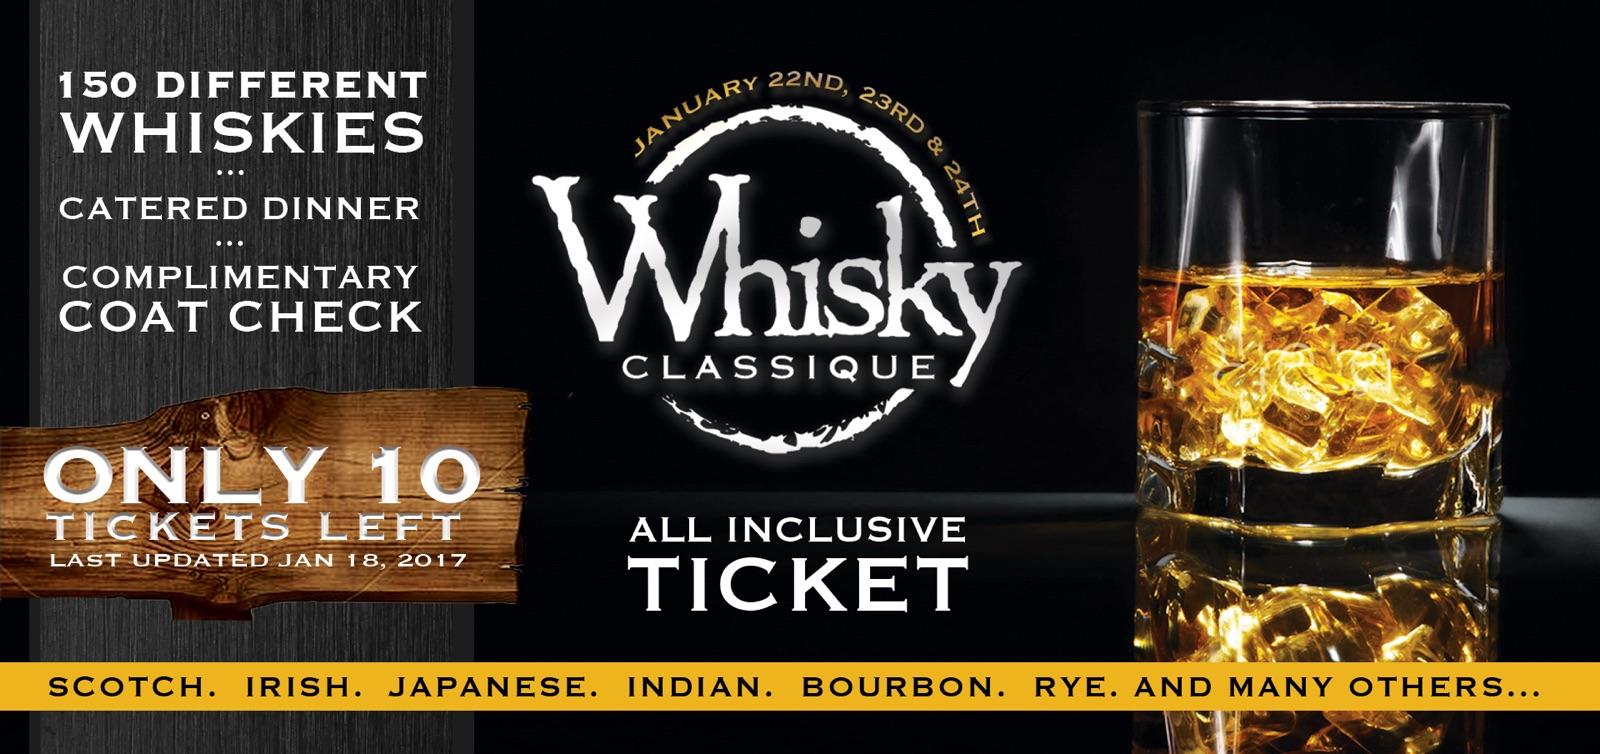 Whisky Classique